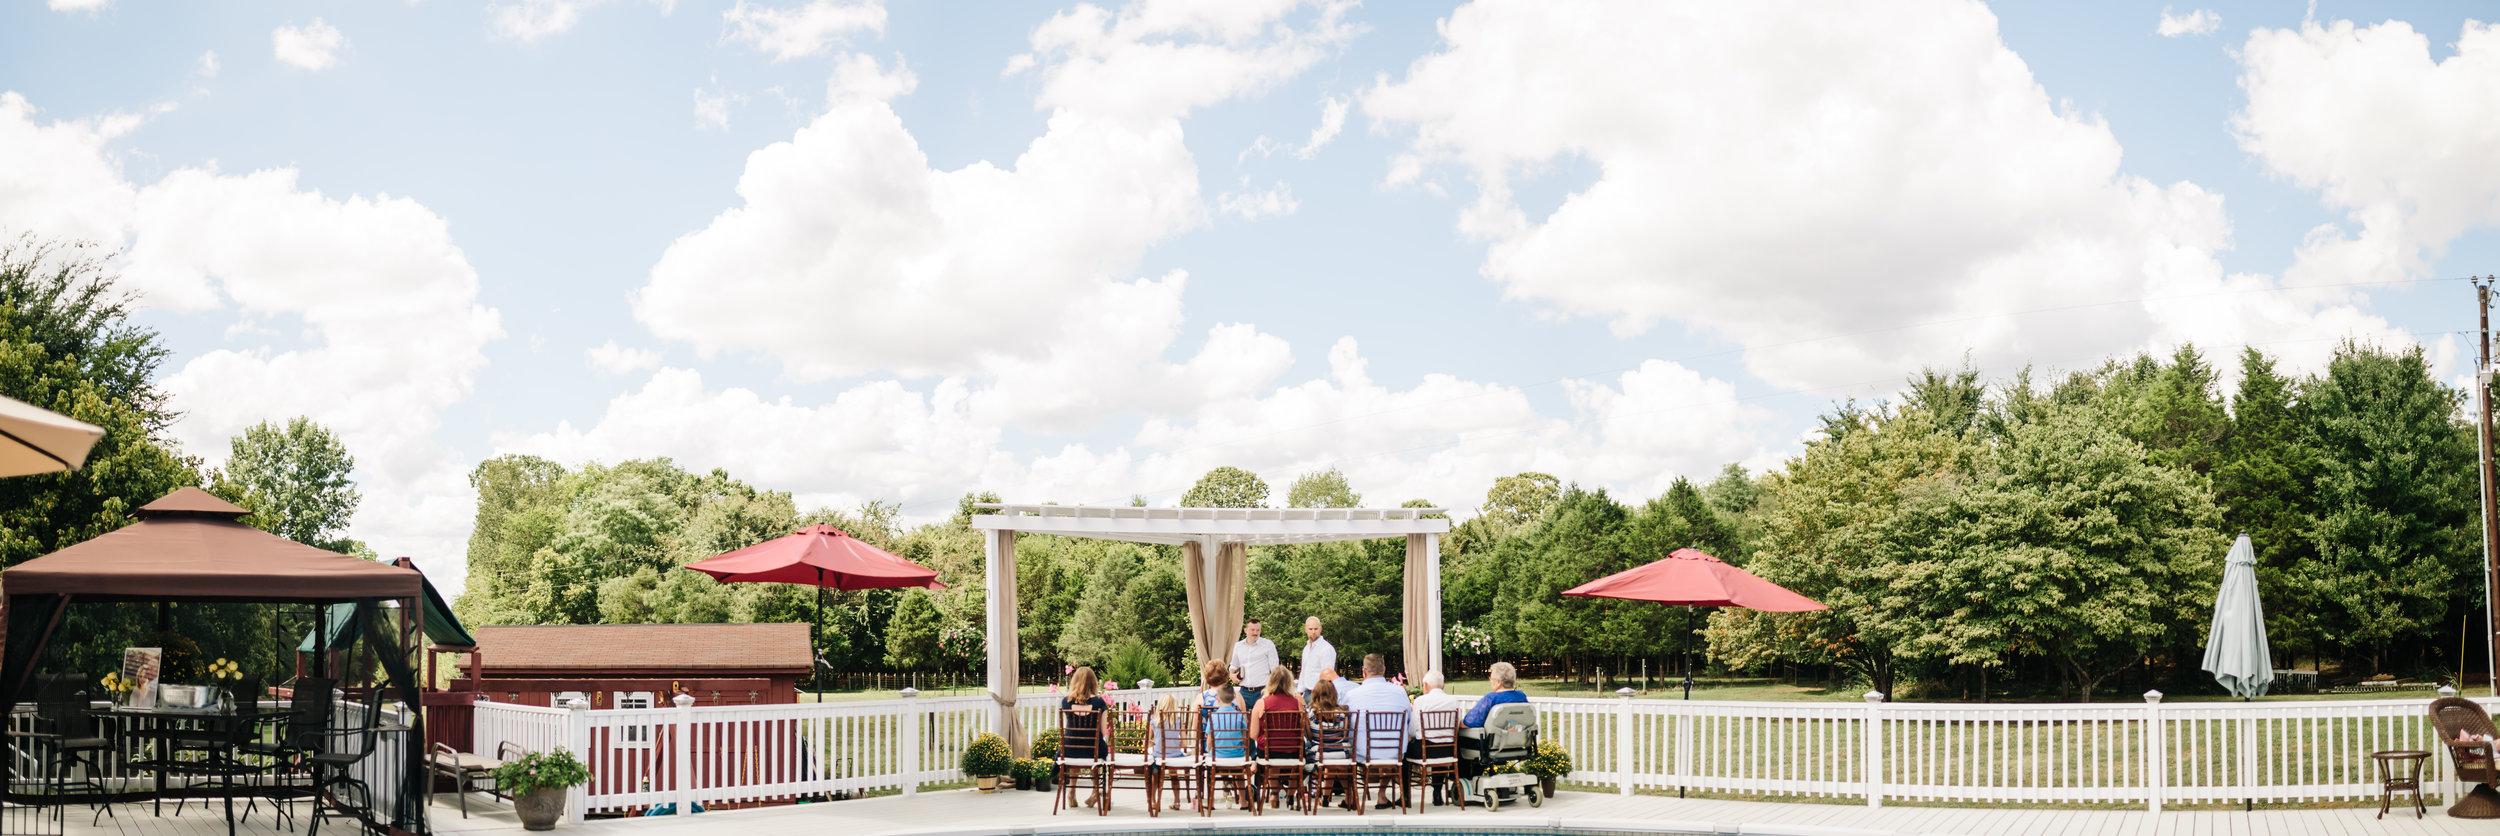 2018.09.02 Ray and Sarah Prizner Nashville TN Wedding FINALS-224.jpg